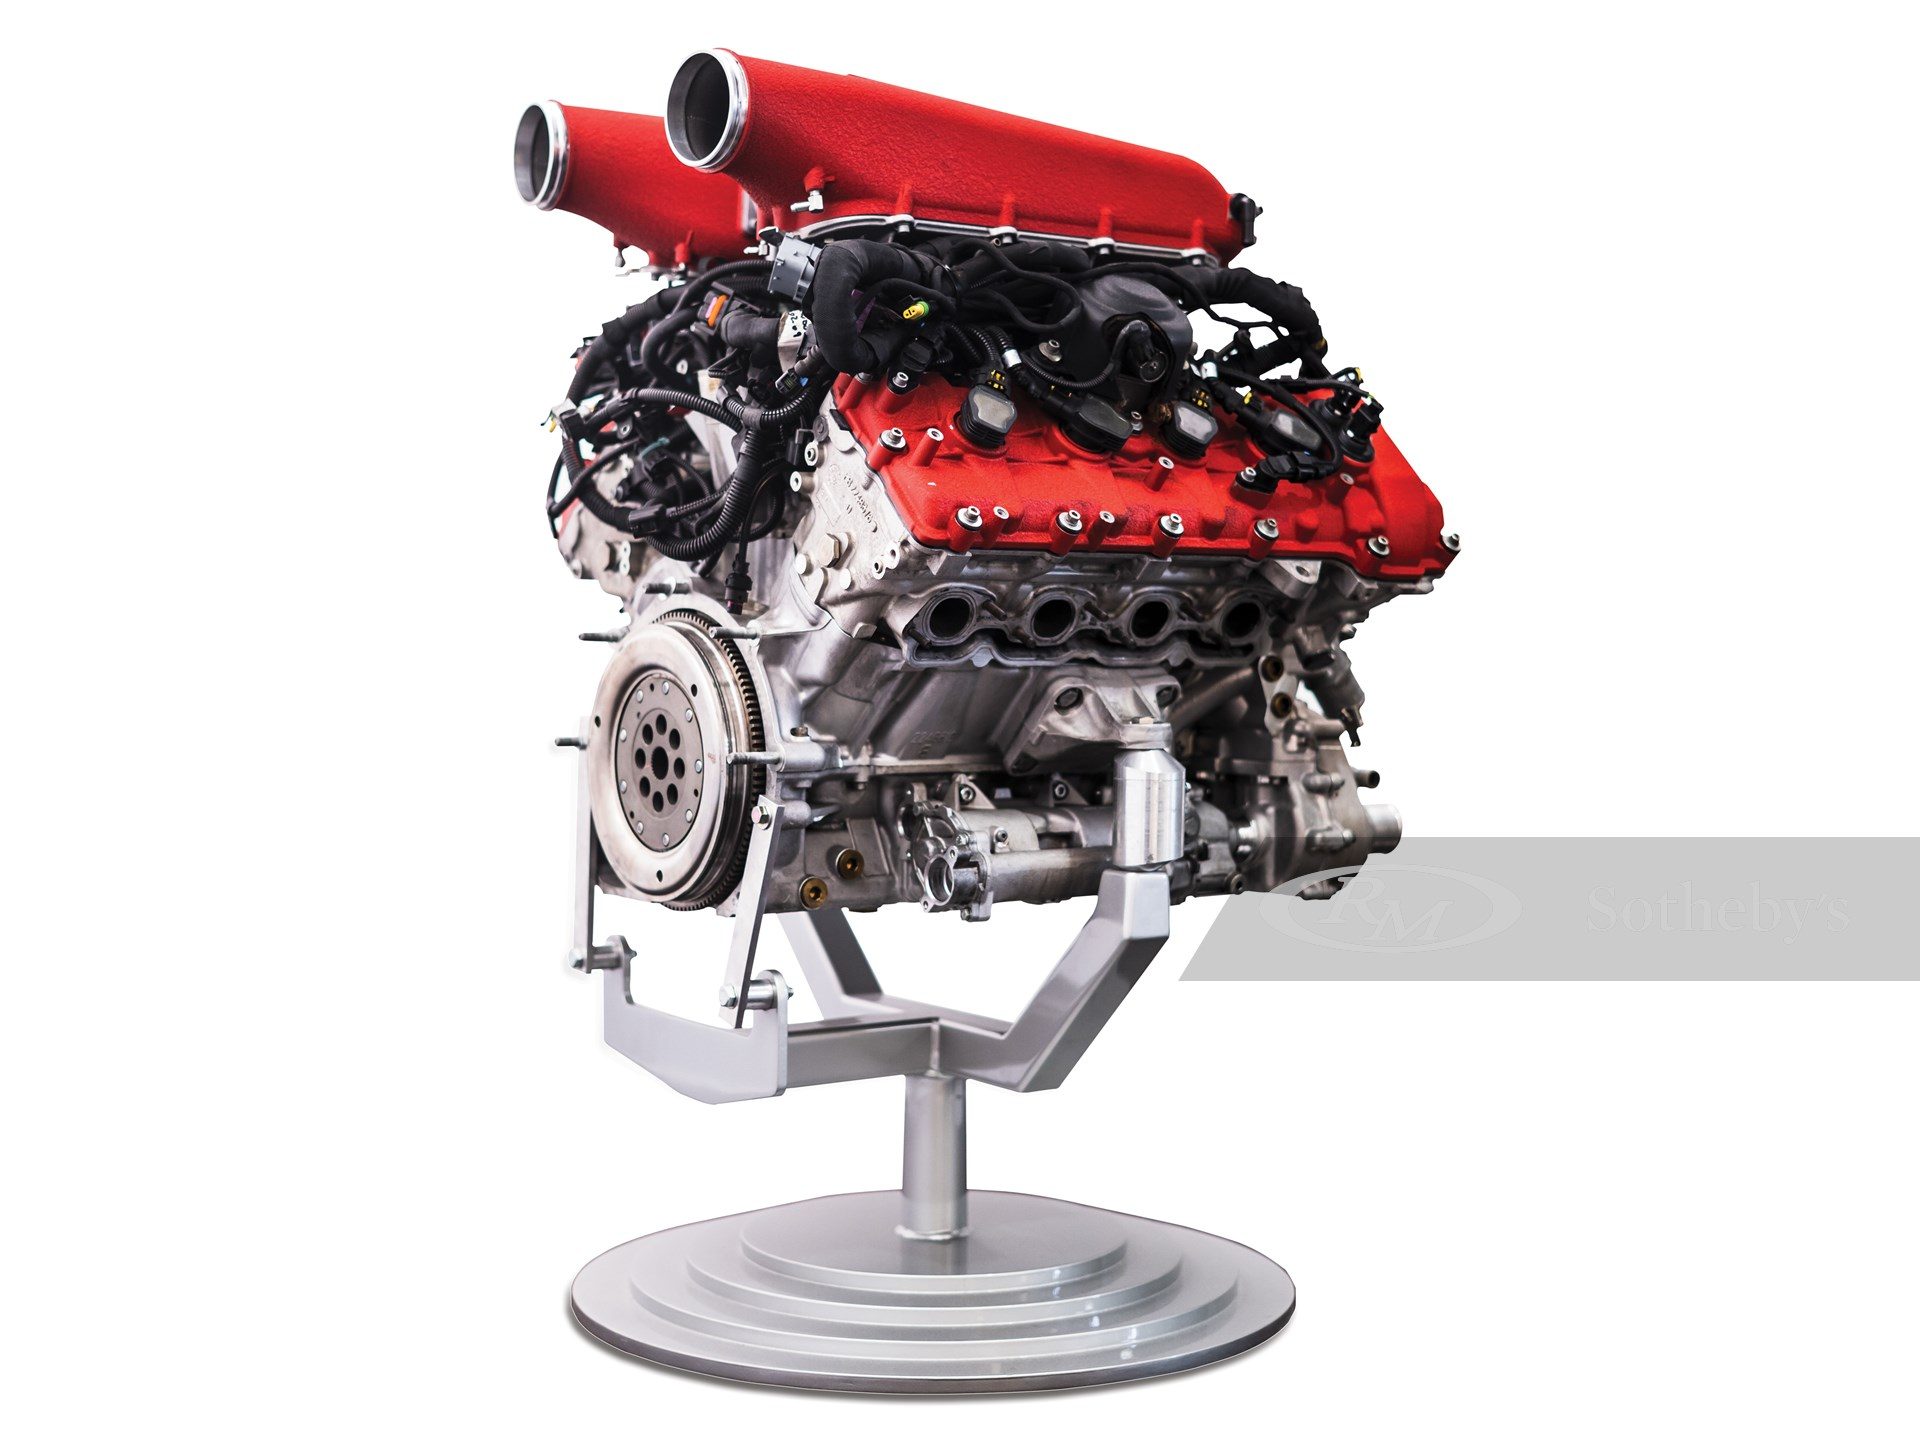 Ferrari 458 Engine, No. 189773, with Stand -